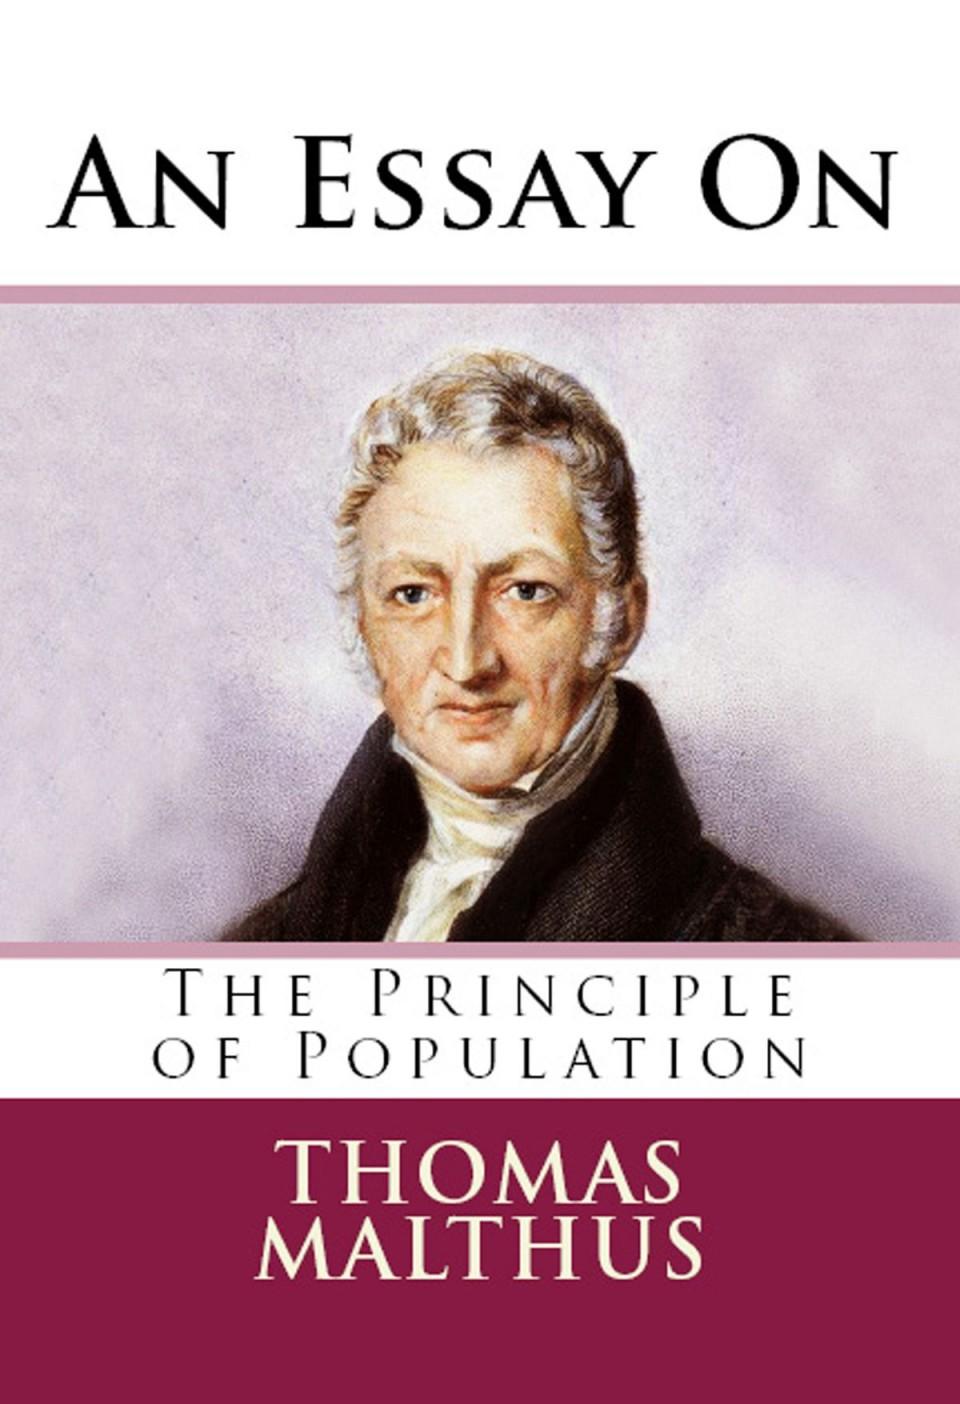 010 Essay On The Principle Of Population An Singular Malthus Sparknotes Thomas Main Idea 960